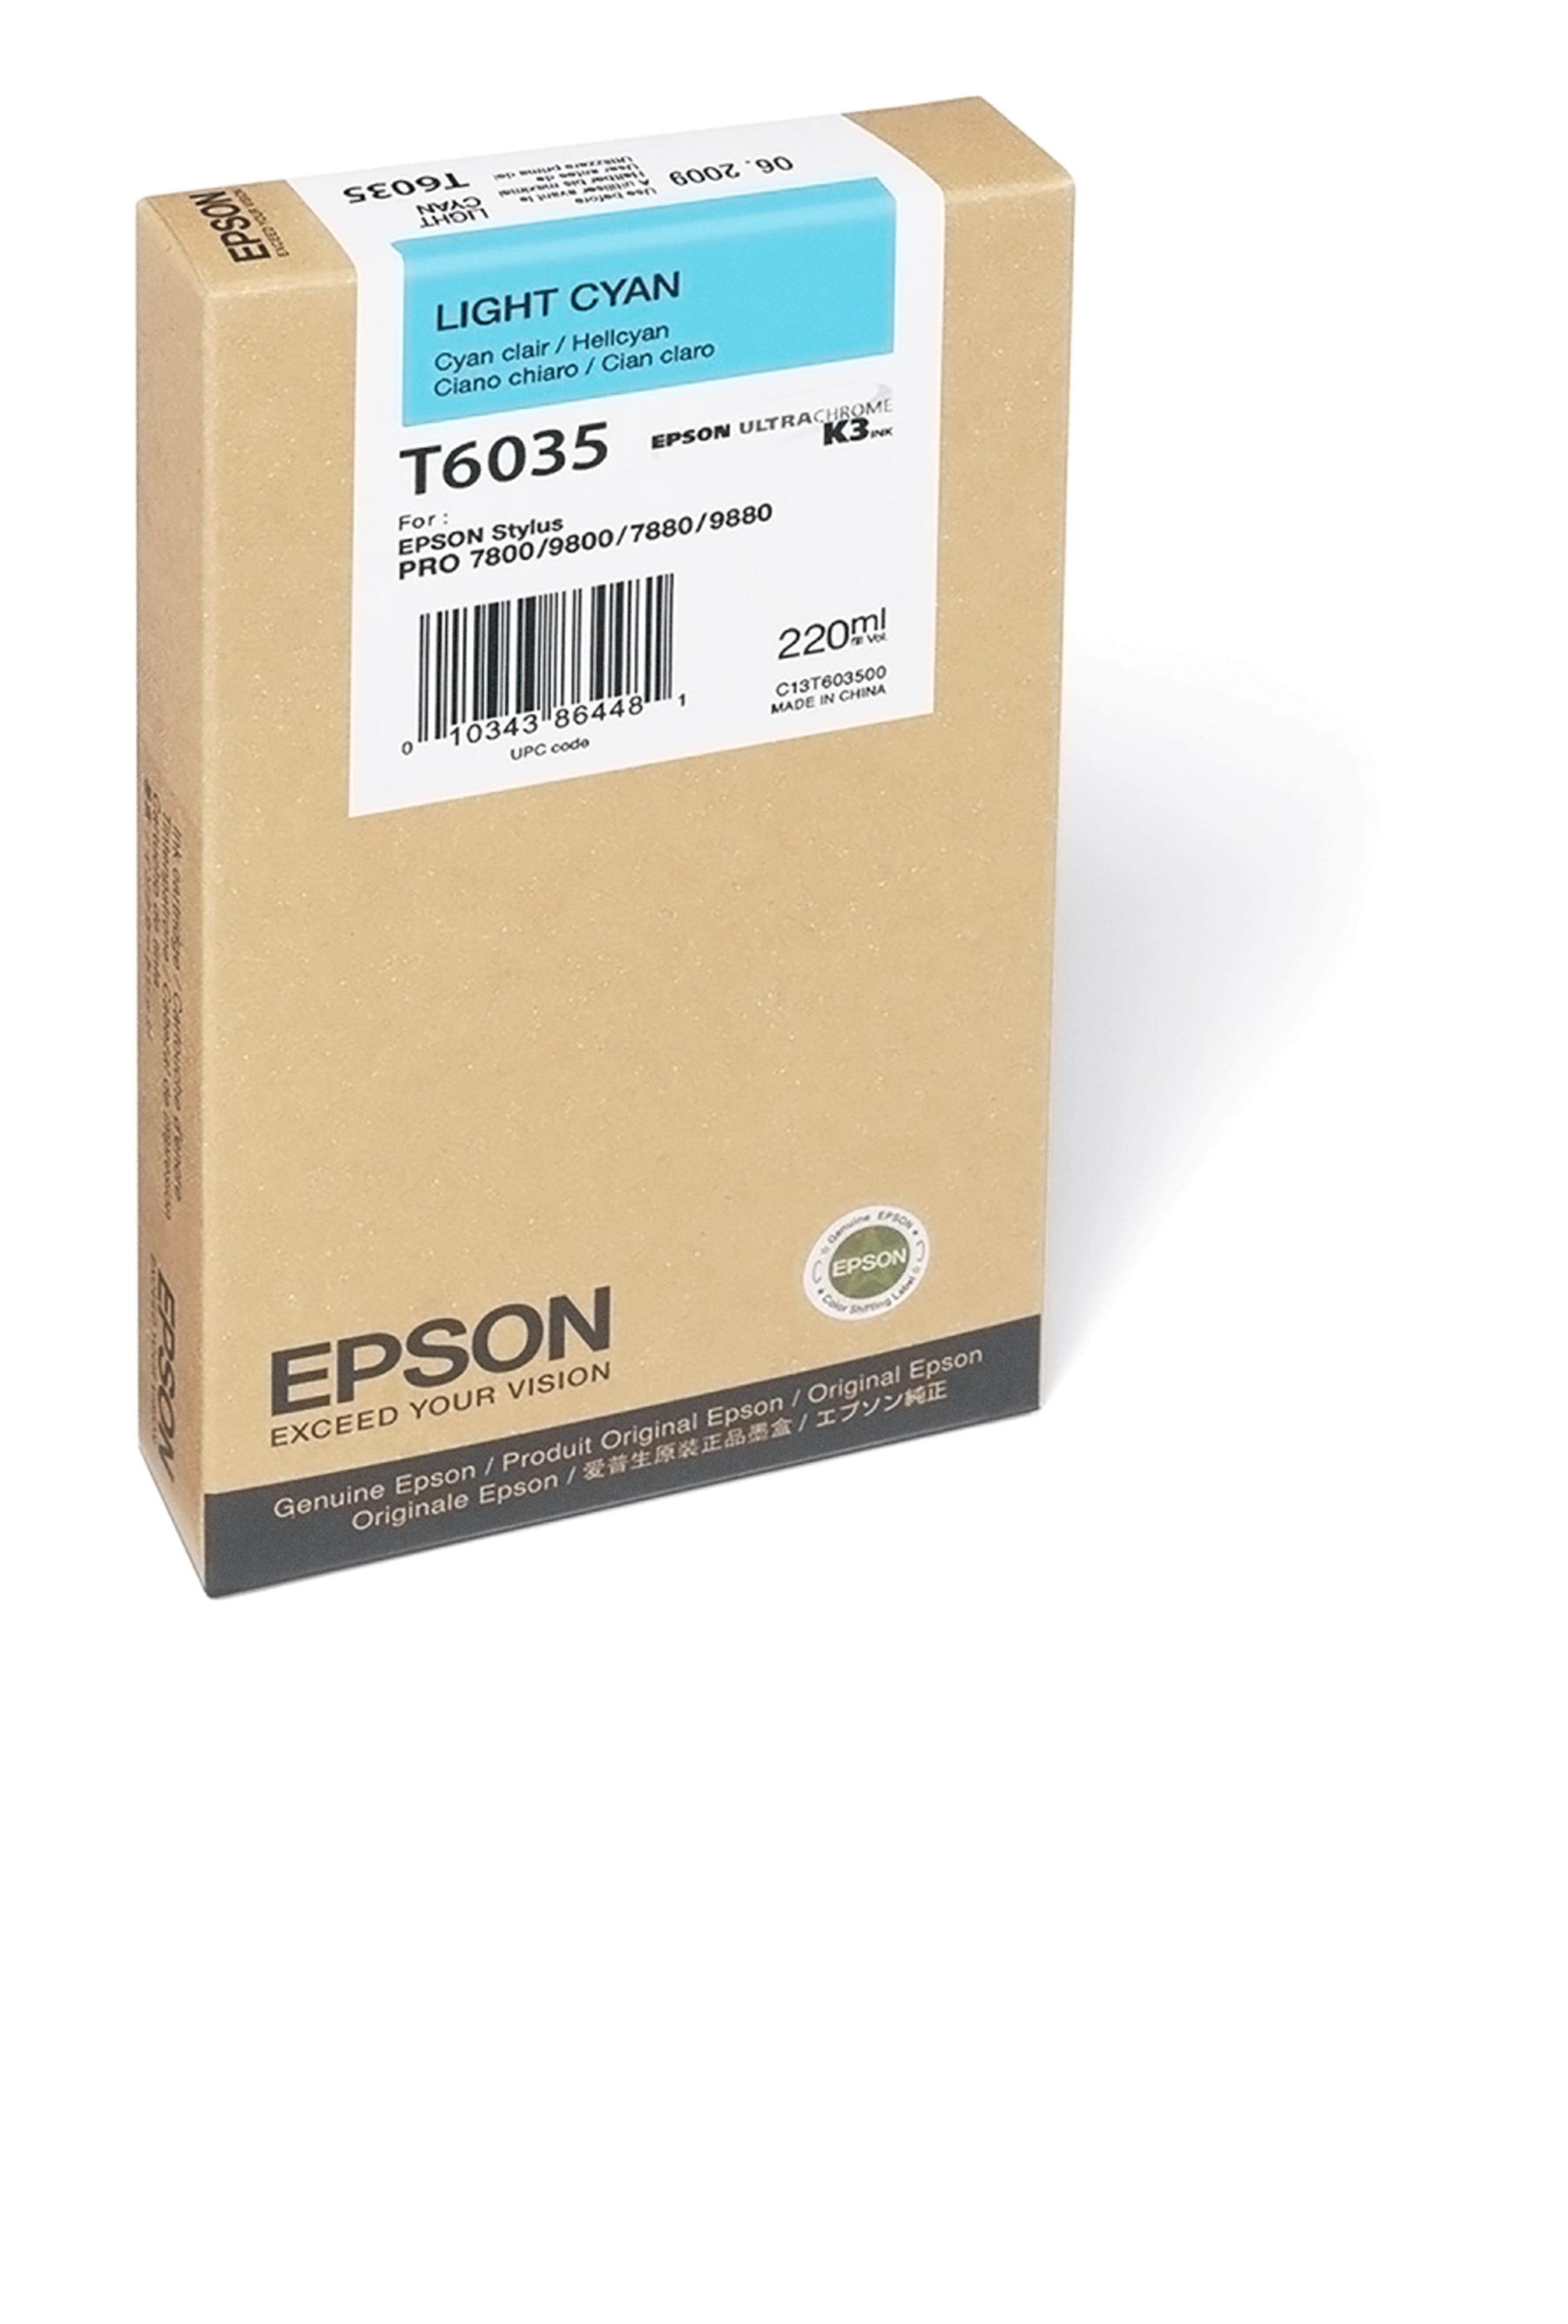 Epson EPSON SD LT CYAN INK (220 ML) (T603500)